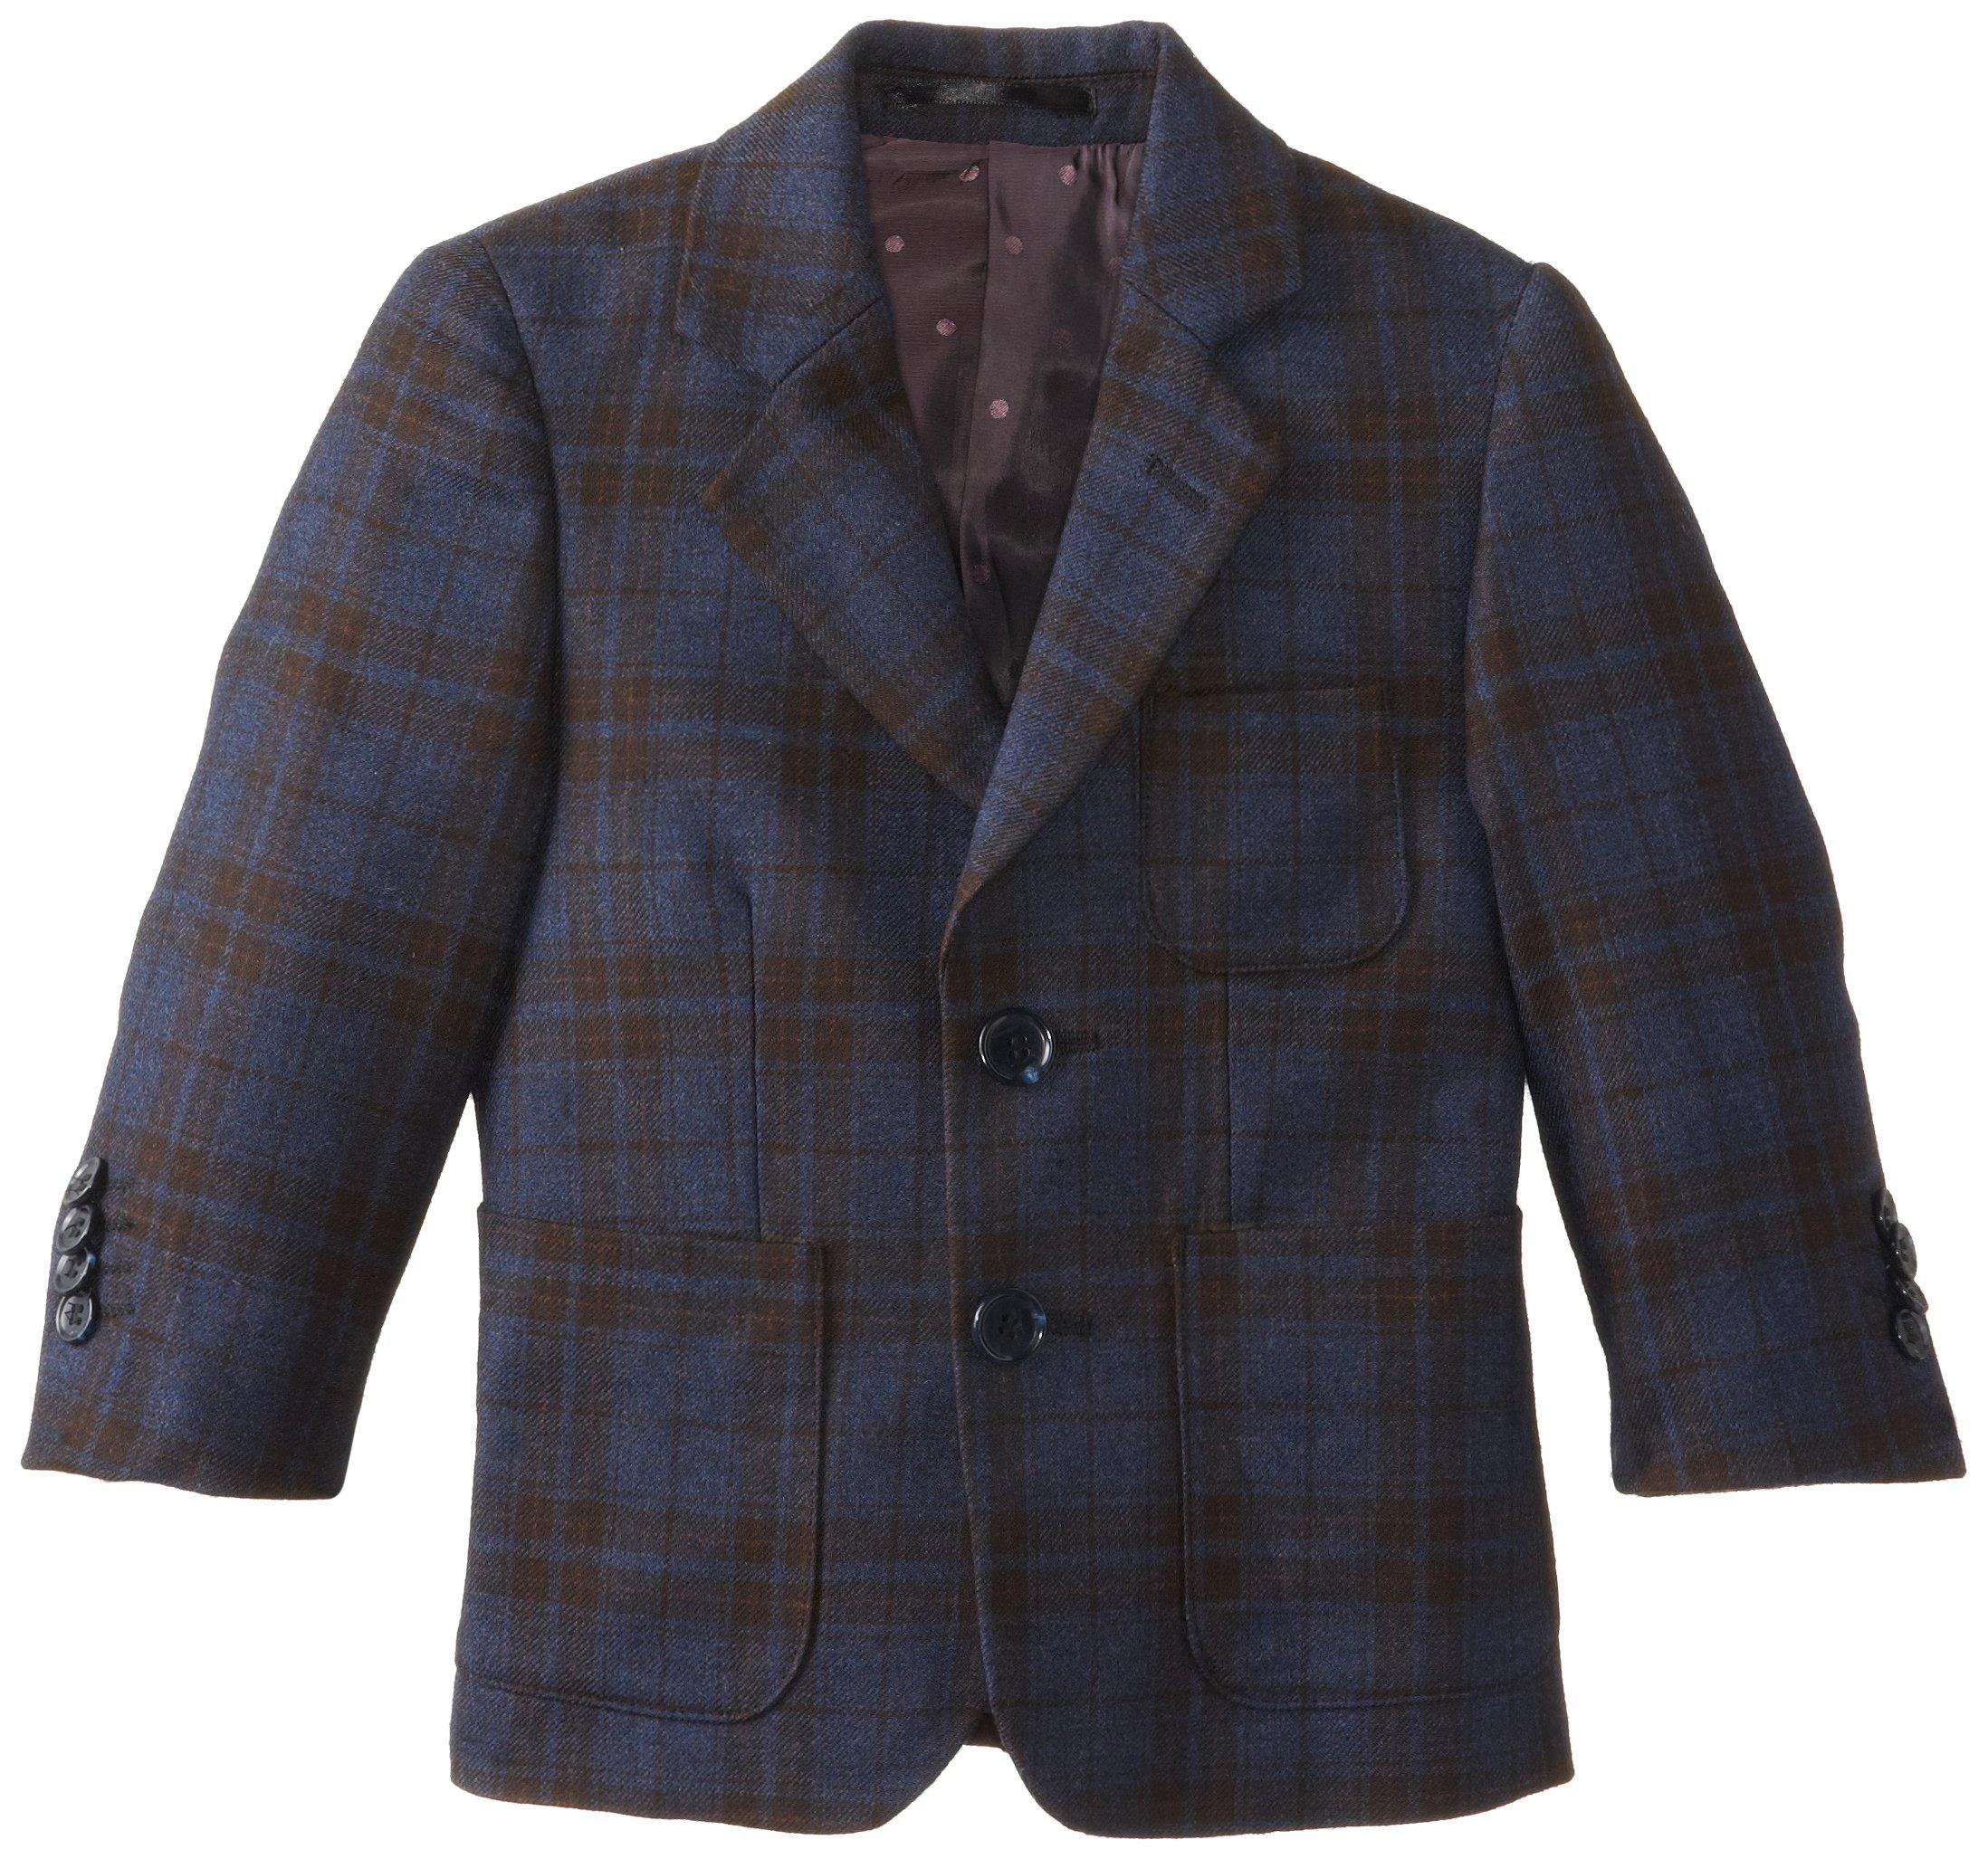 Isaac Mizrahi Black Label Little Boys' Little Pure Wool Large Plaid Blazer, Blue, 5